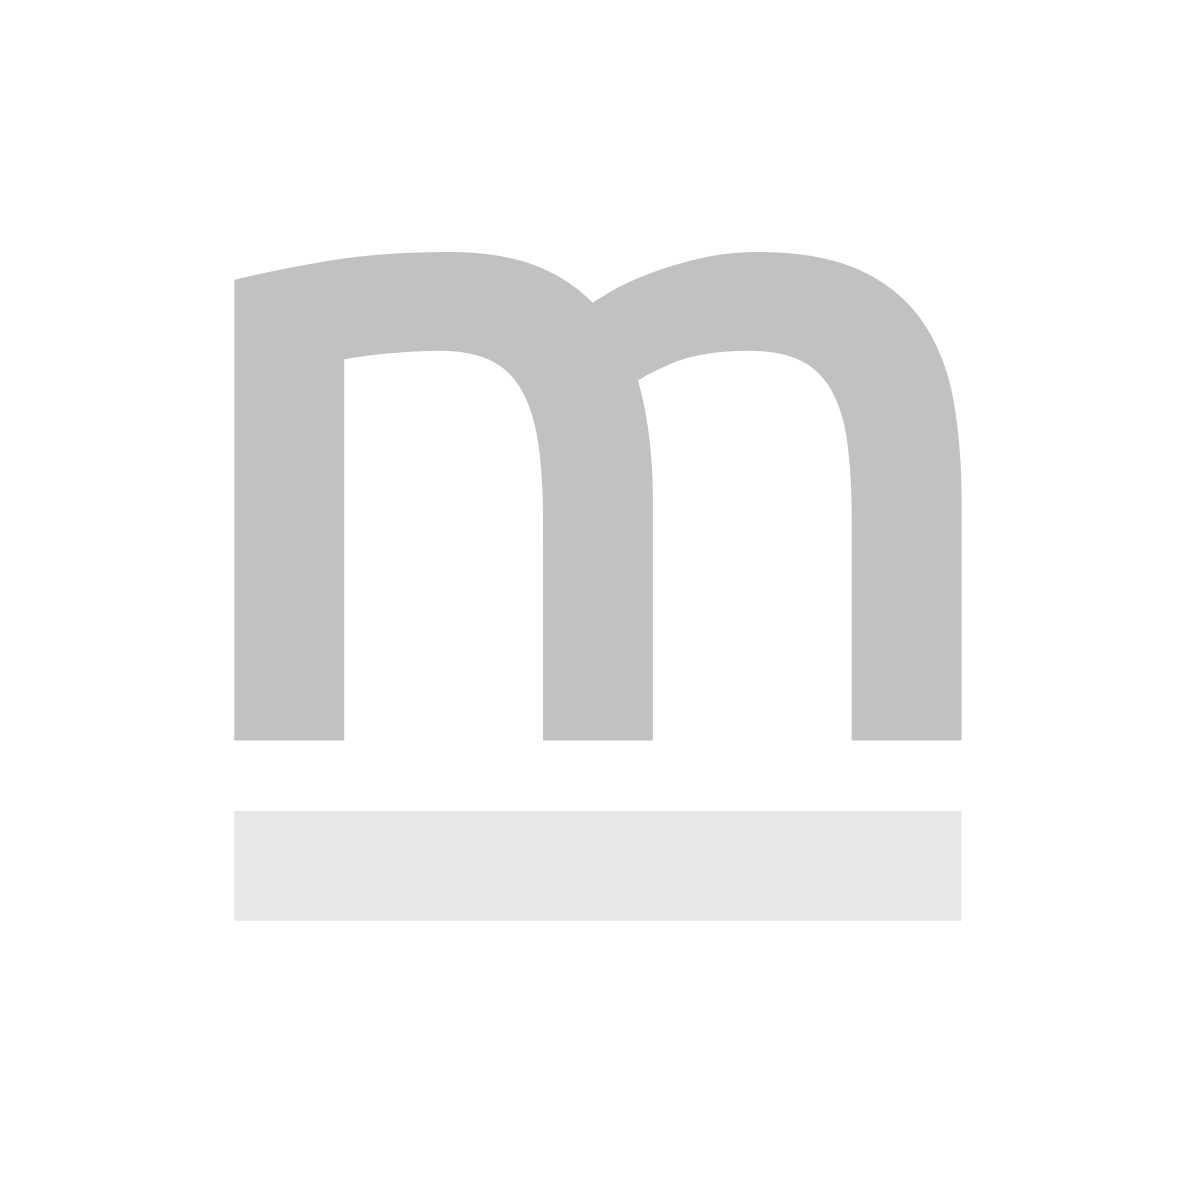 Krzesło JENISEJ VELVET jasno szare